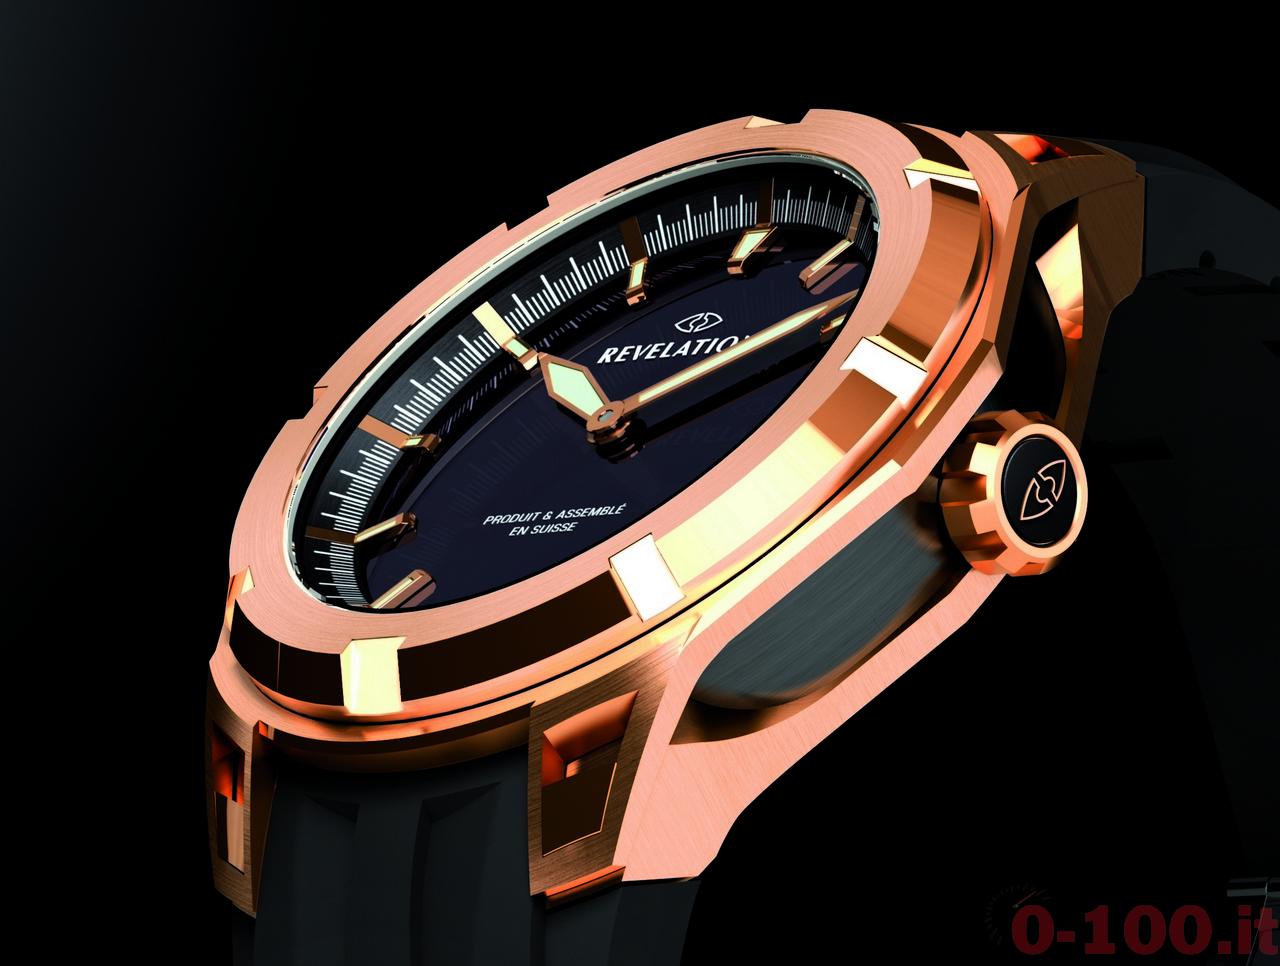 anteprima-baselworld-2014-revelation-r04-tourbillon-magical-watch-dial_0-1001